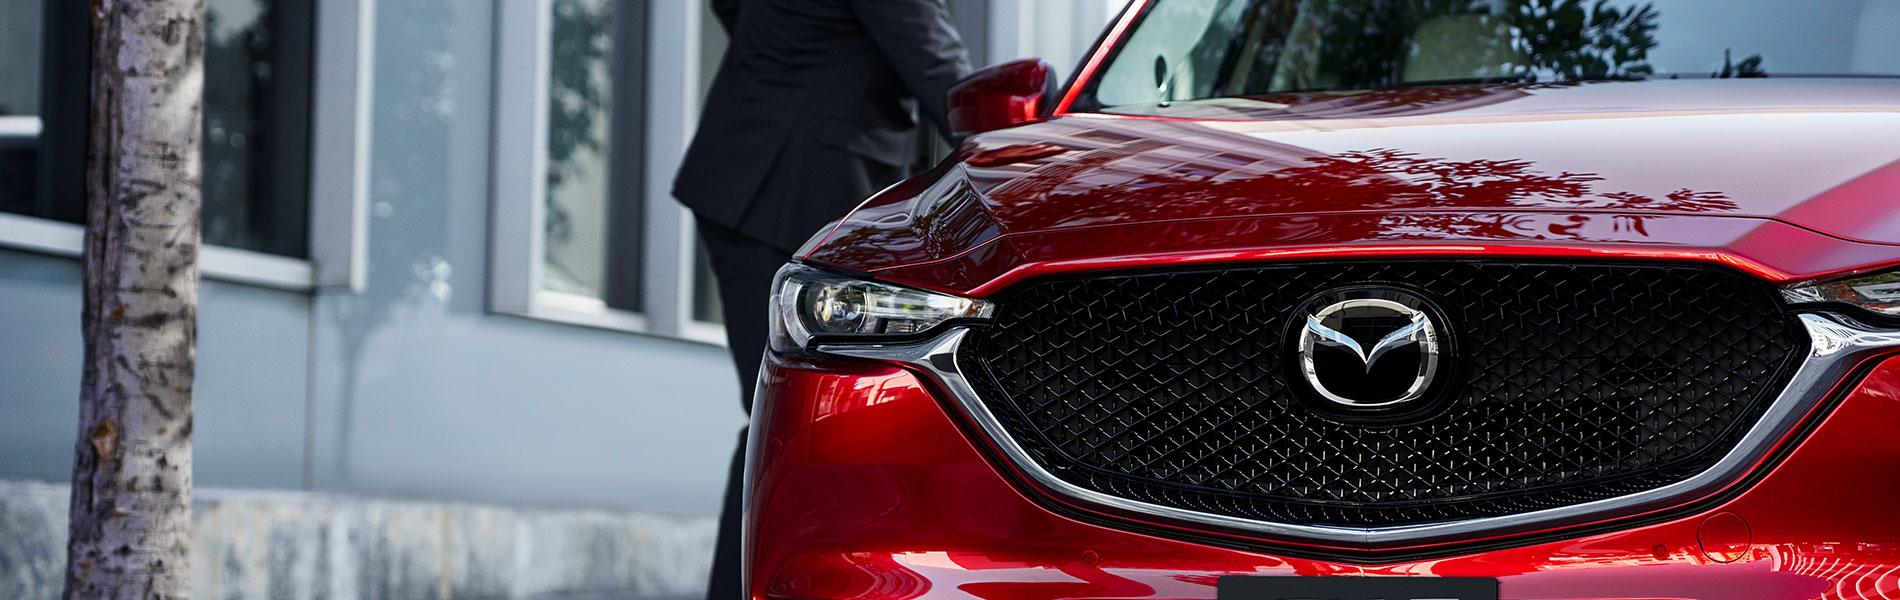 Mazda Next-Gen CX-5 Image 1